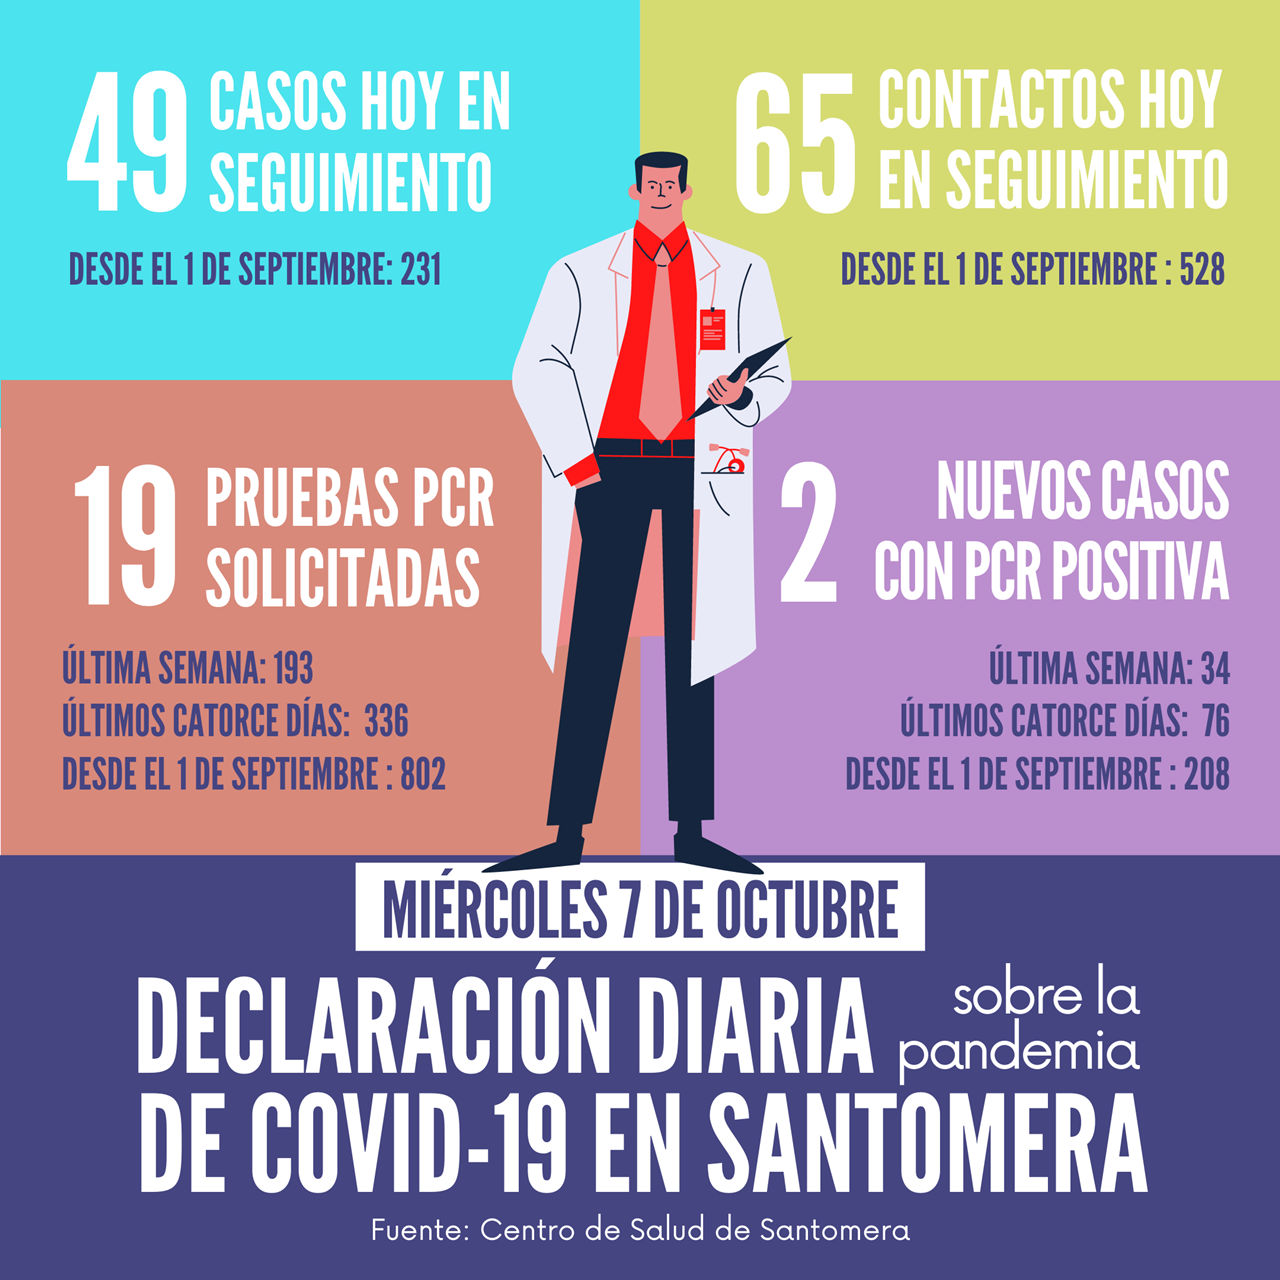 20201007_Datos COVID-19 Santomera